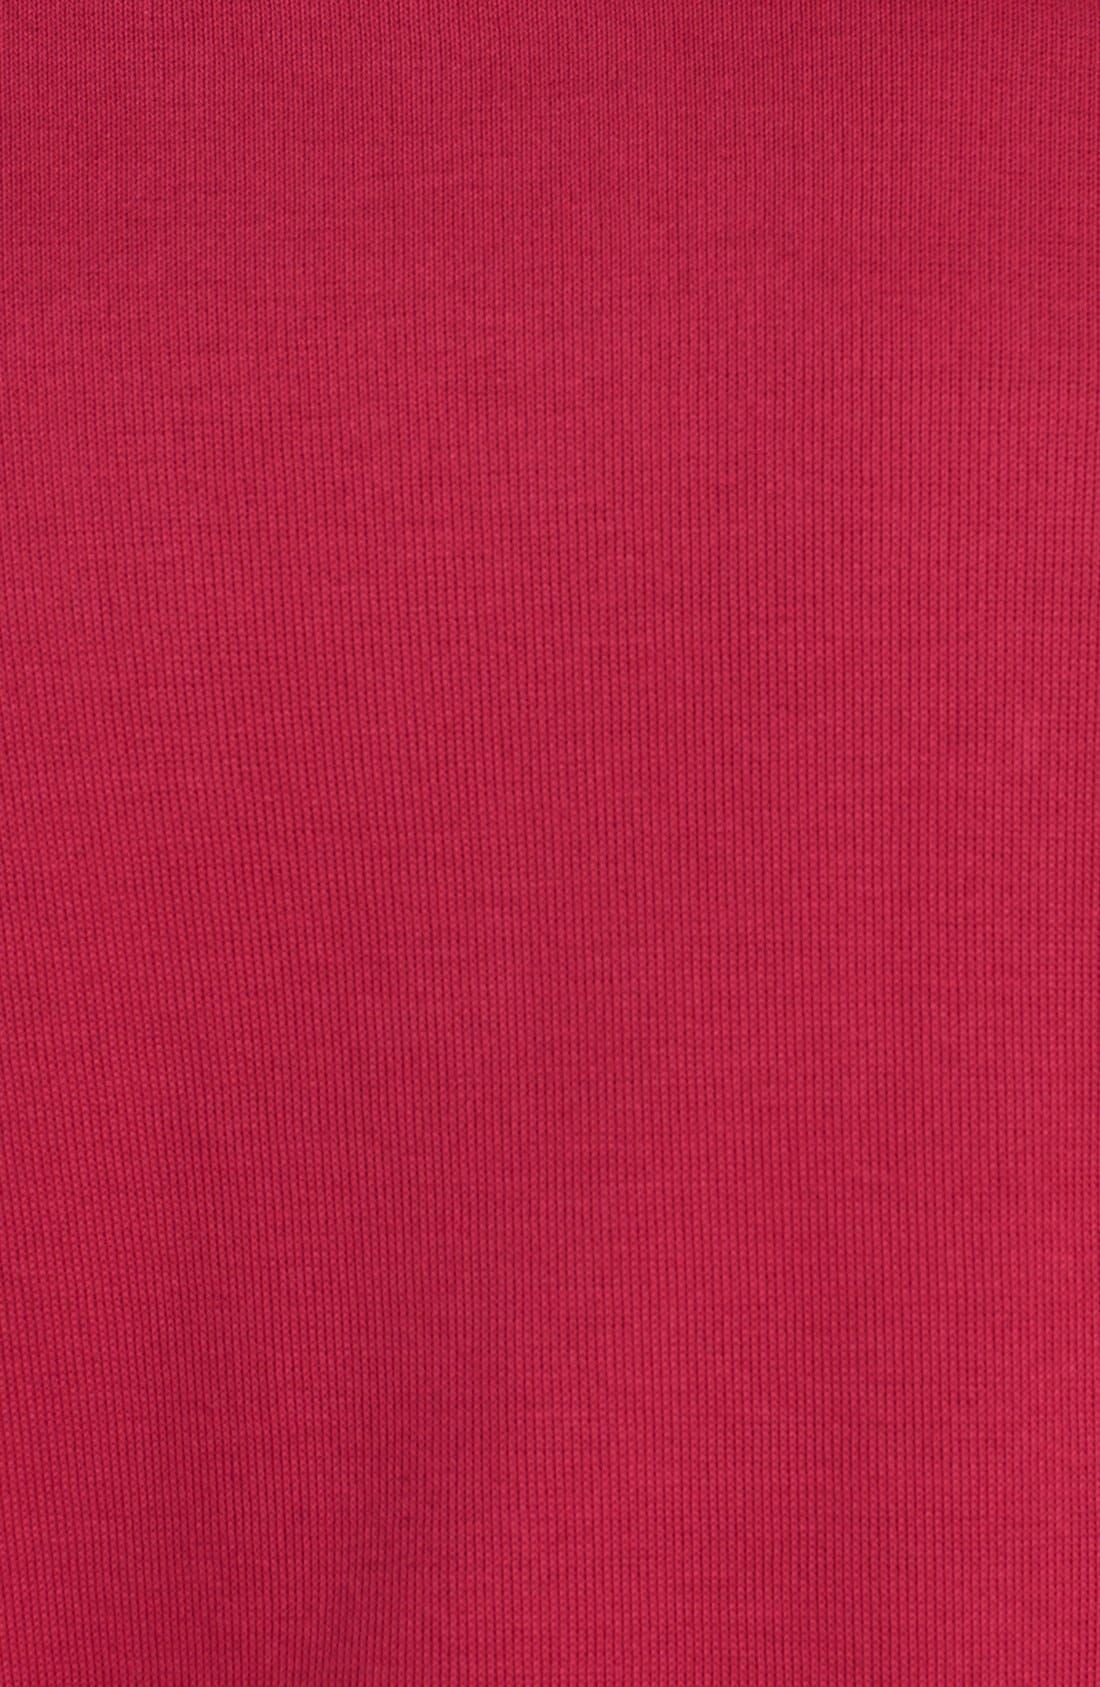 Alternate Image 3  - Cutter & Buck 'Flatback' Pullover Sweatshirt (Big & Tall)